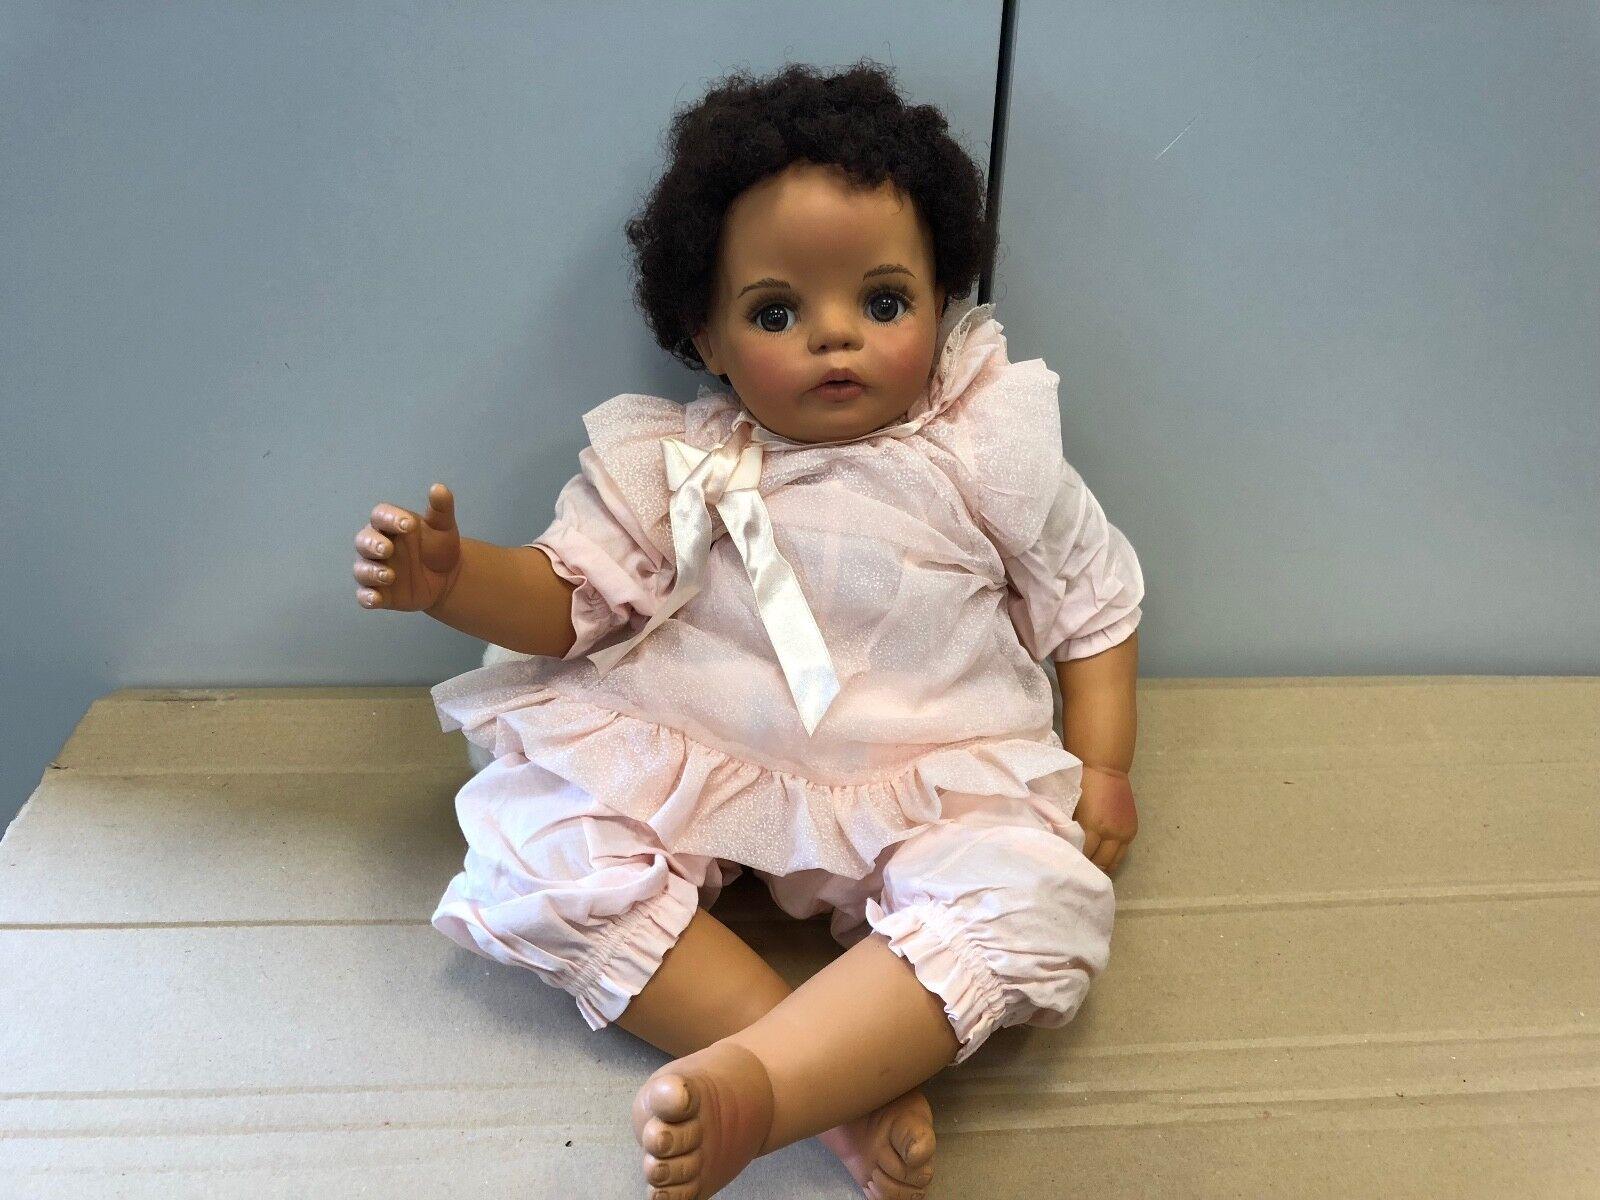 Monika peter leicht vinile bambola 54 CM. OTTIMO stato